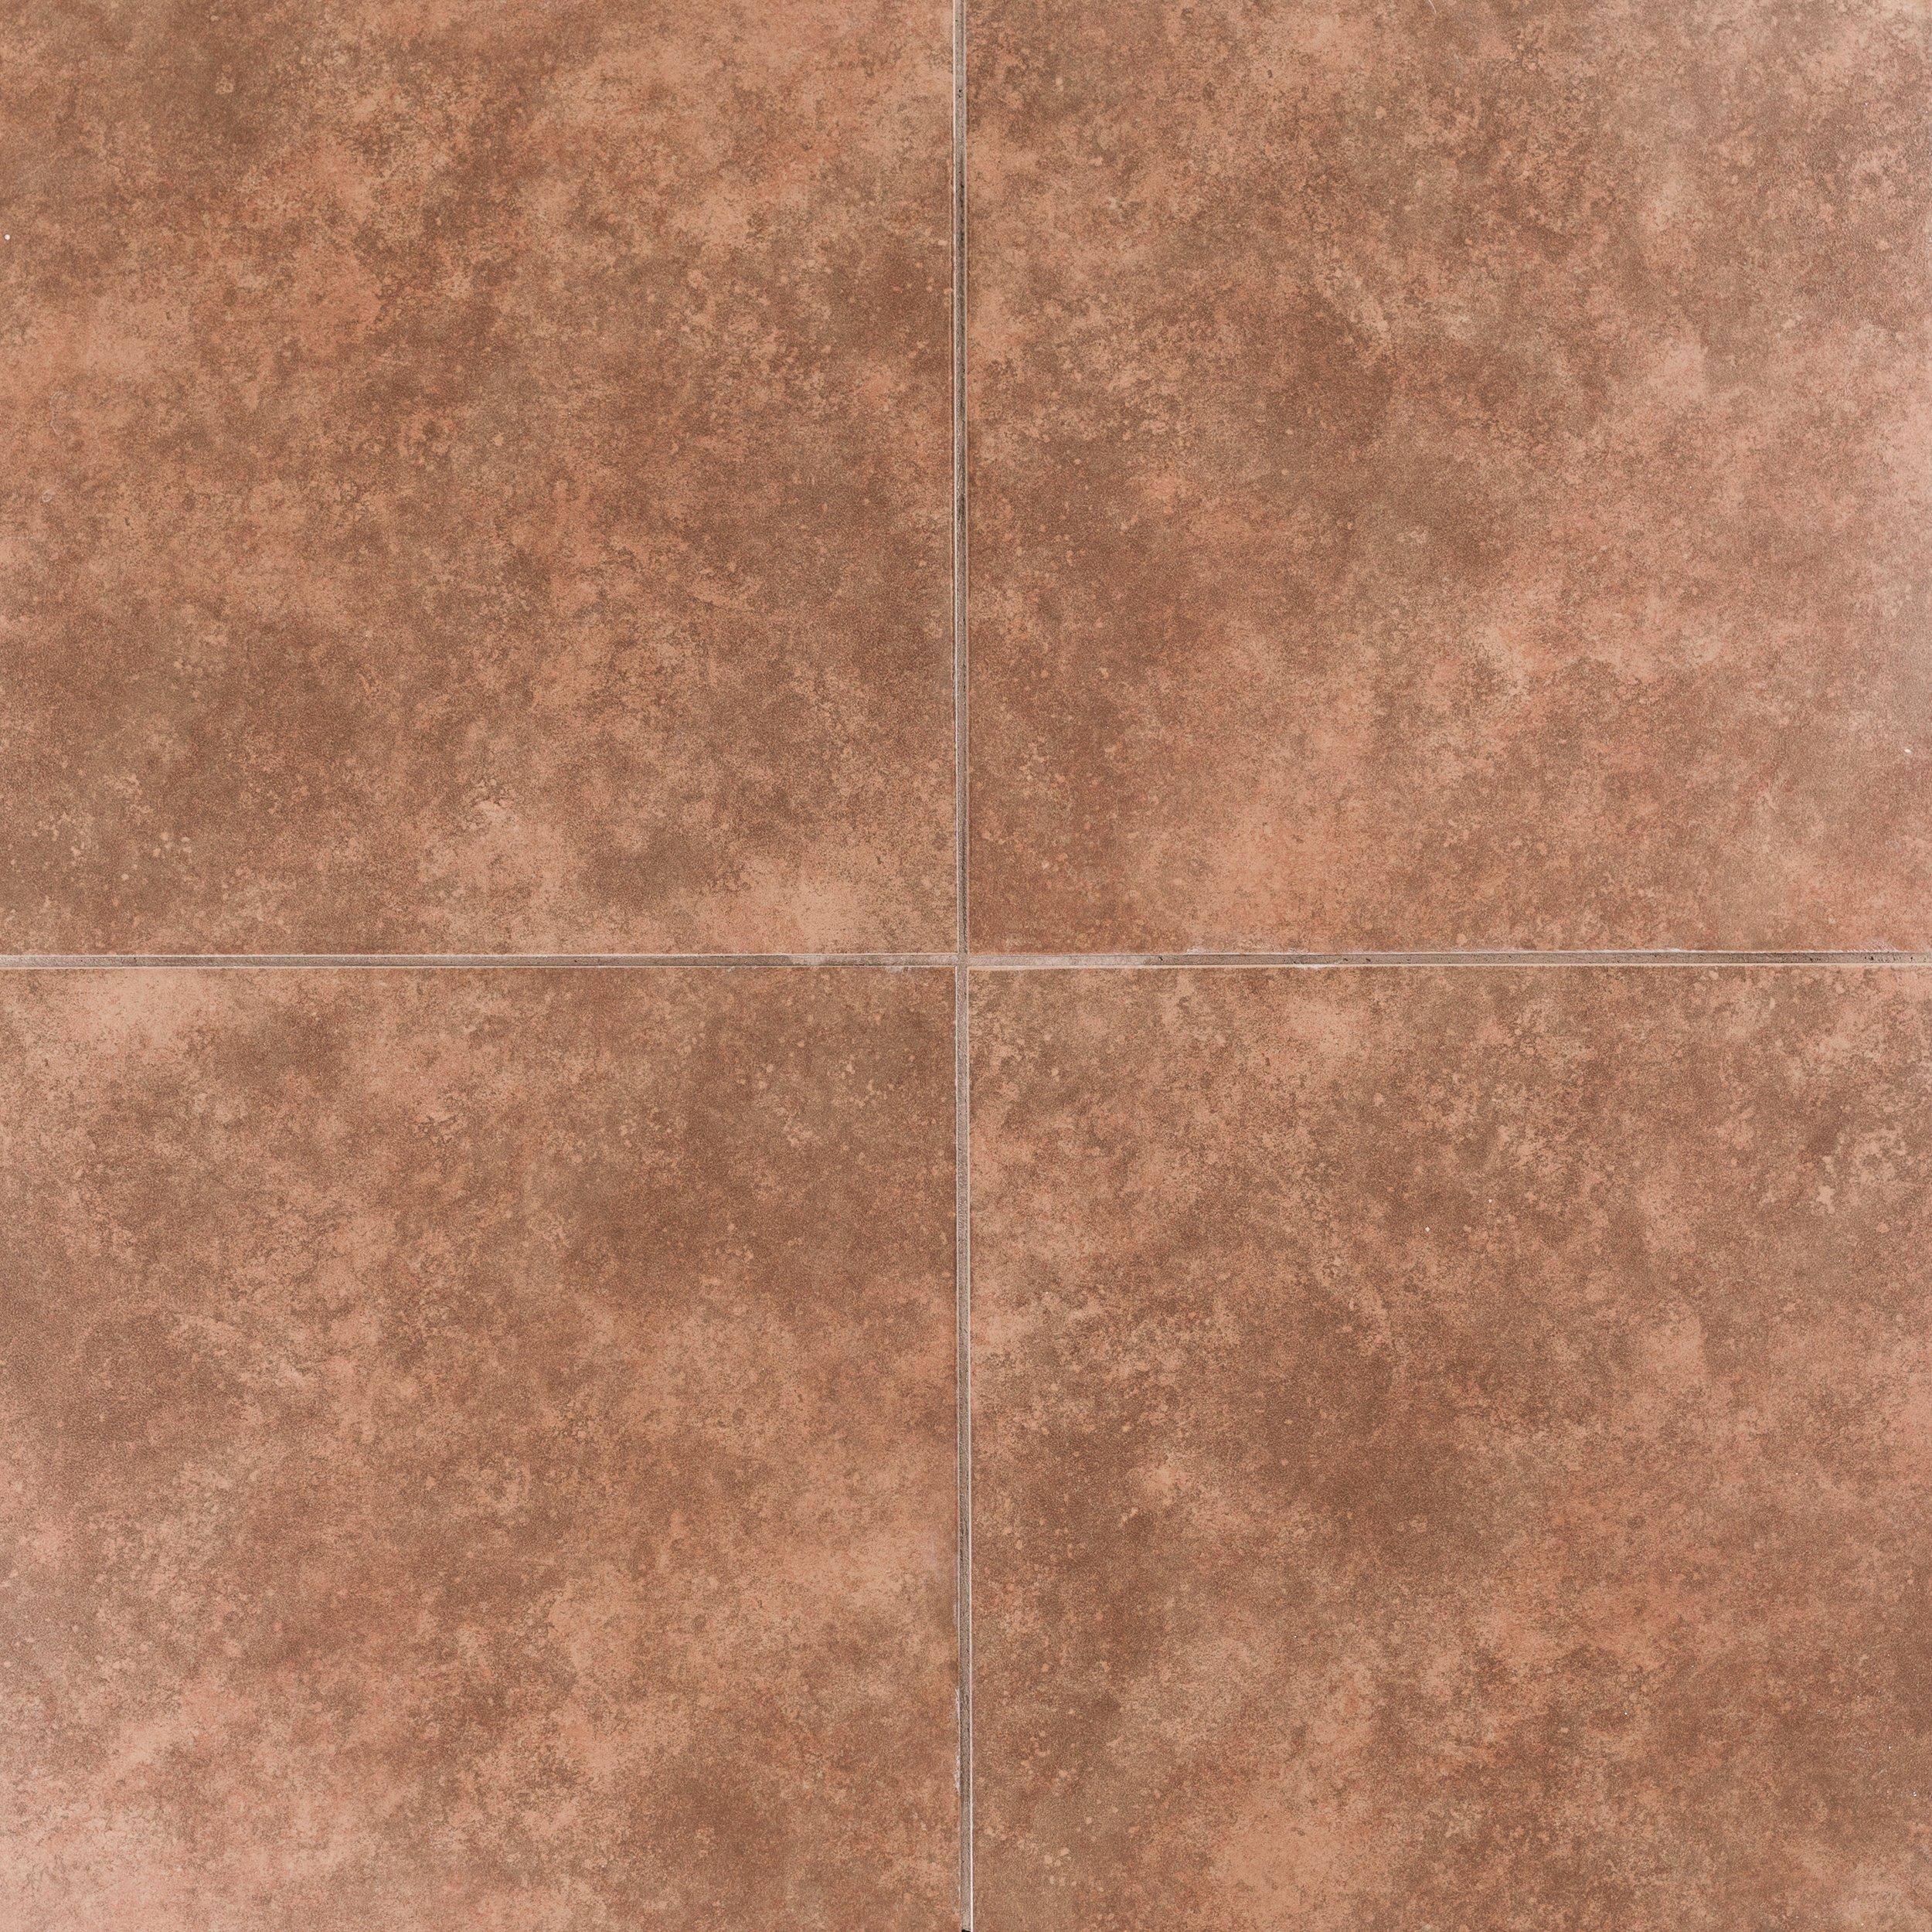 Fioro Cotto Ceramic Tile 18 X 18 911173465 Floor And Decor